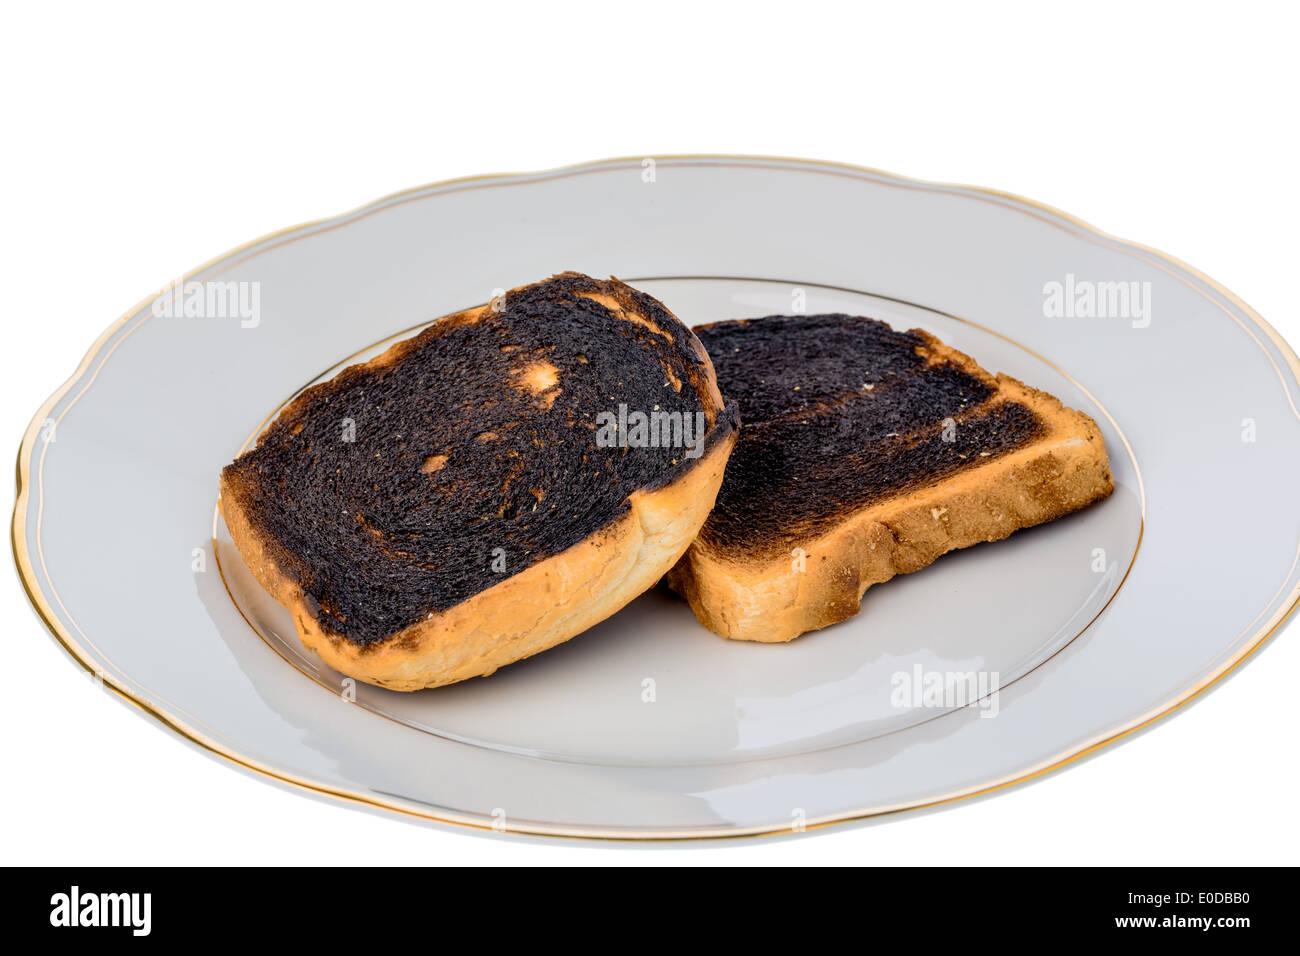 Toastbrot wurde burntly. Burntly toast Scheiben mit Frühstück., Toastbrot Wurde Beim Toasten Verbrannt. Stockfoto